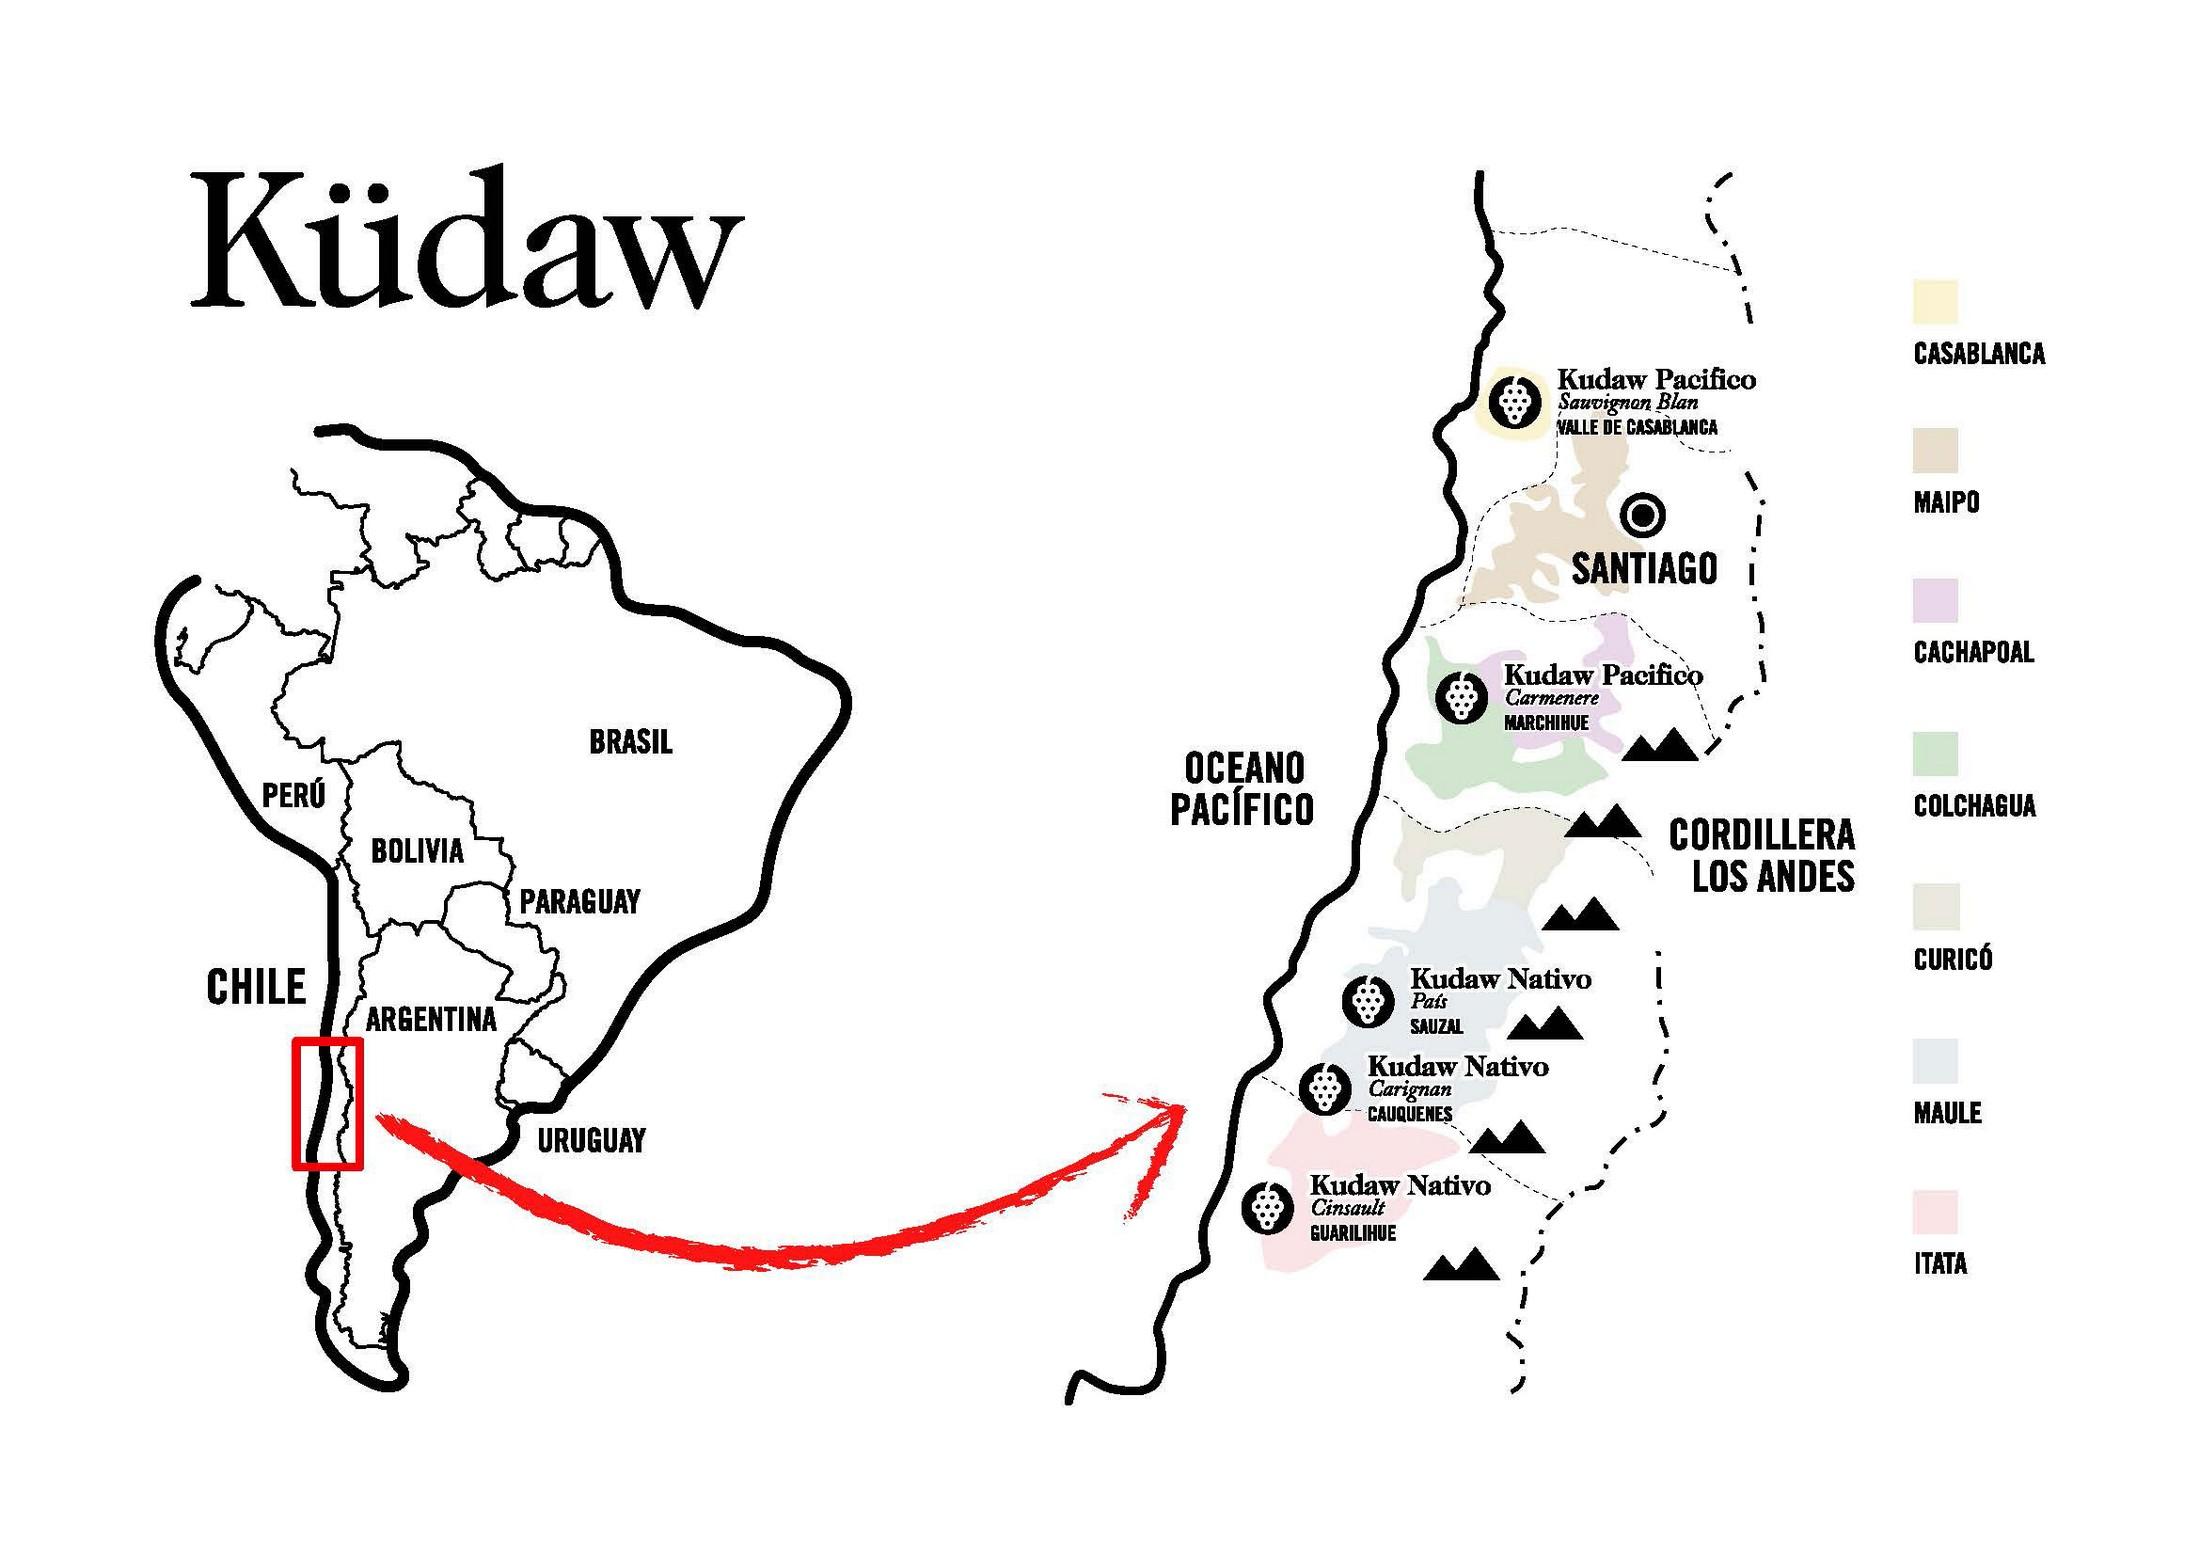 Mapa de Küdaw, los vinos chilenos de Vintae